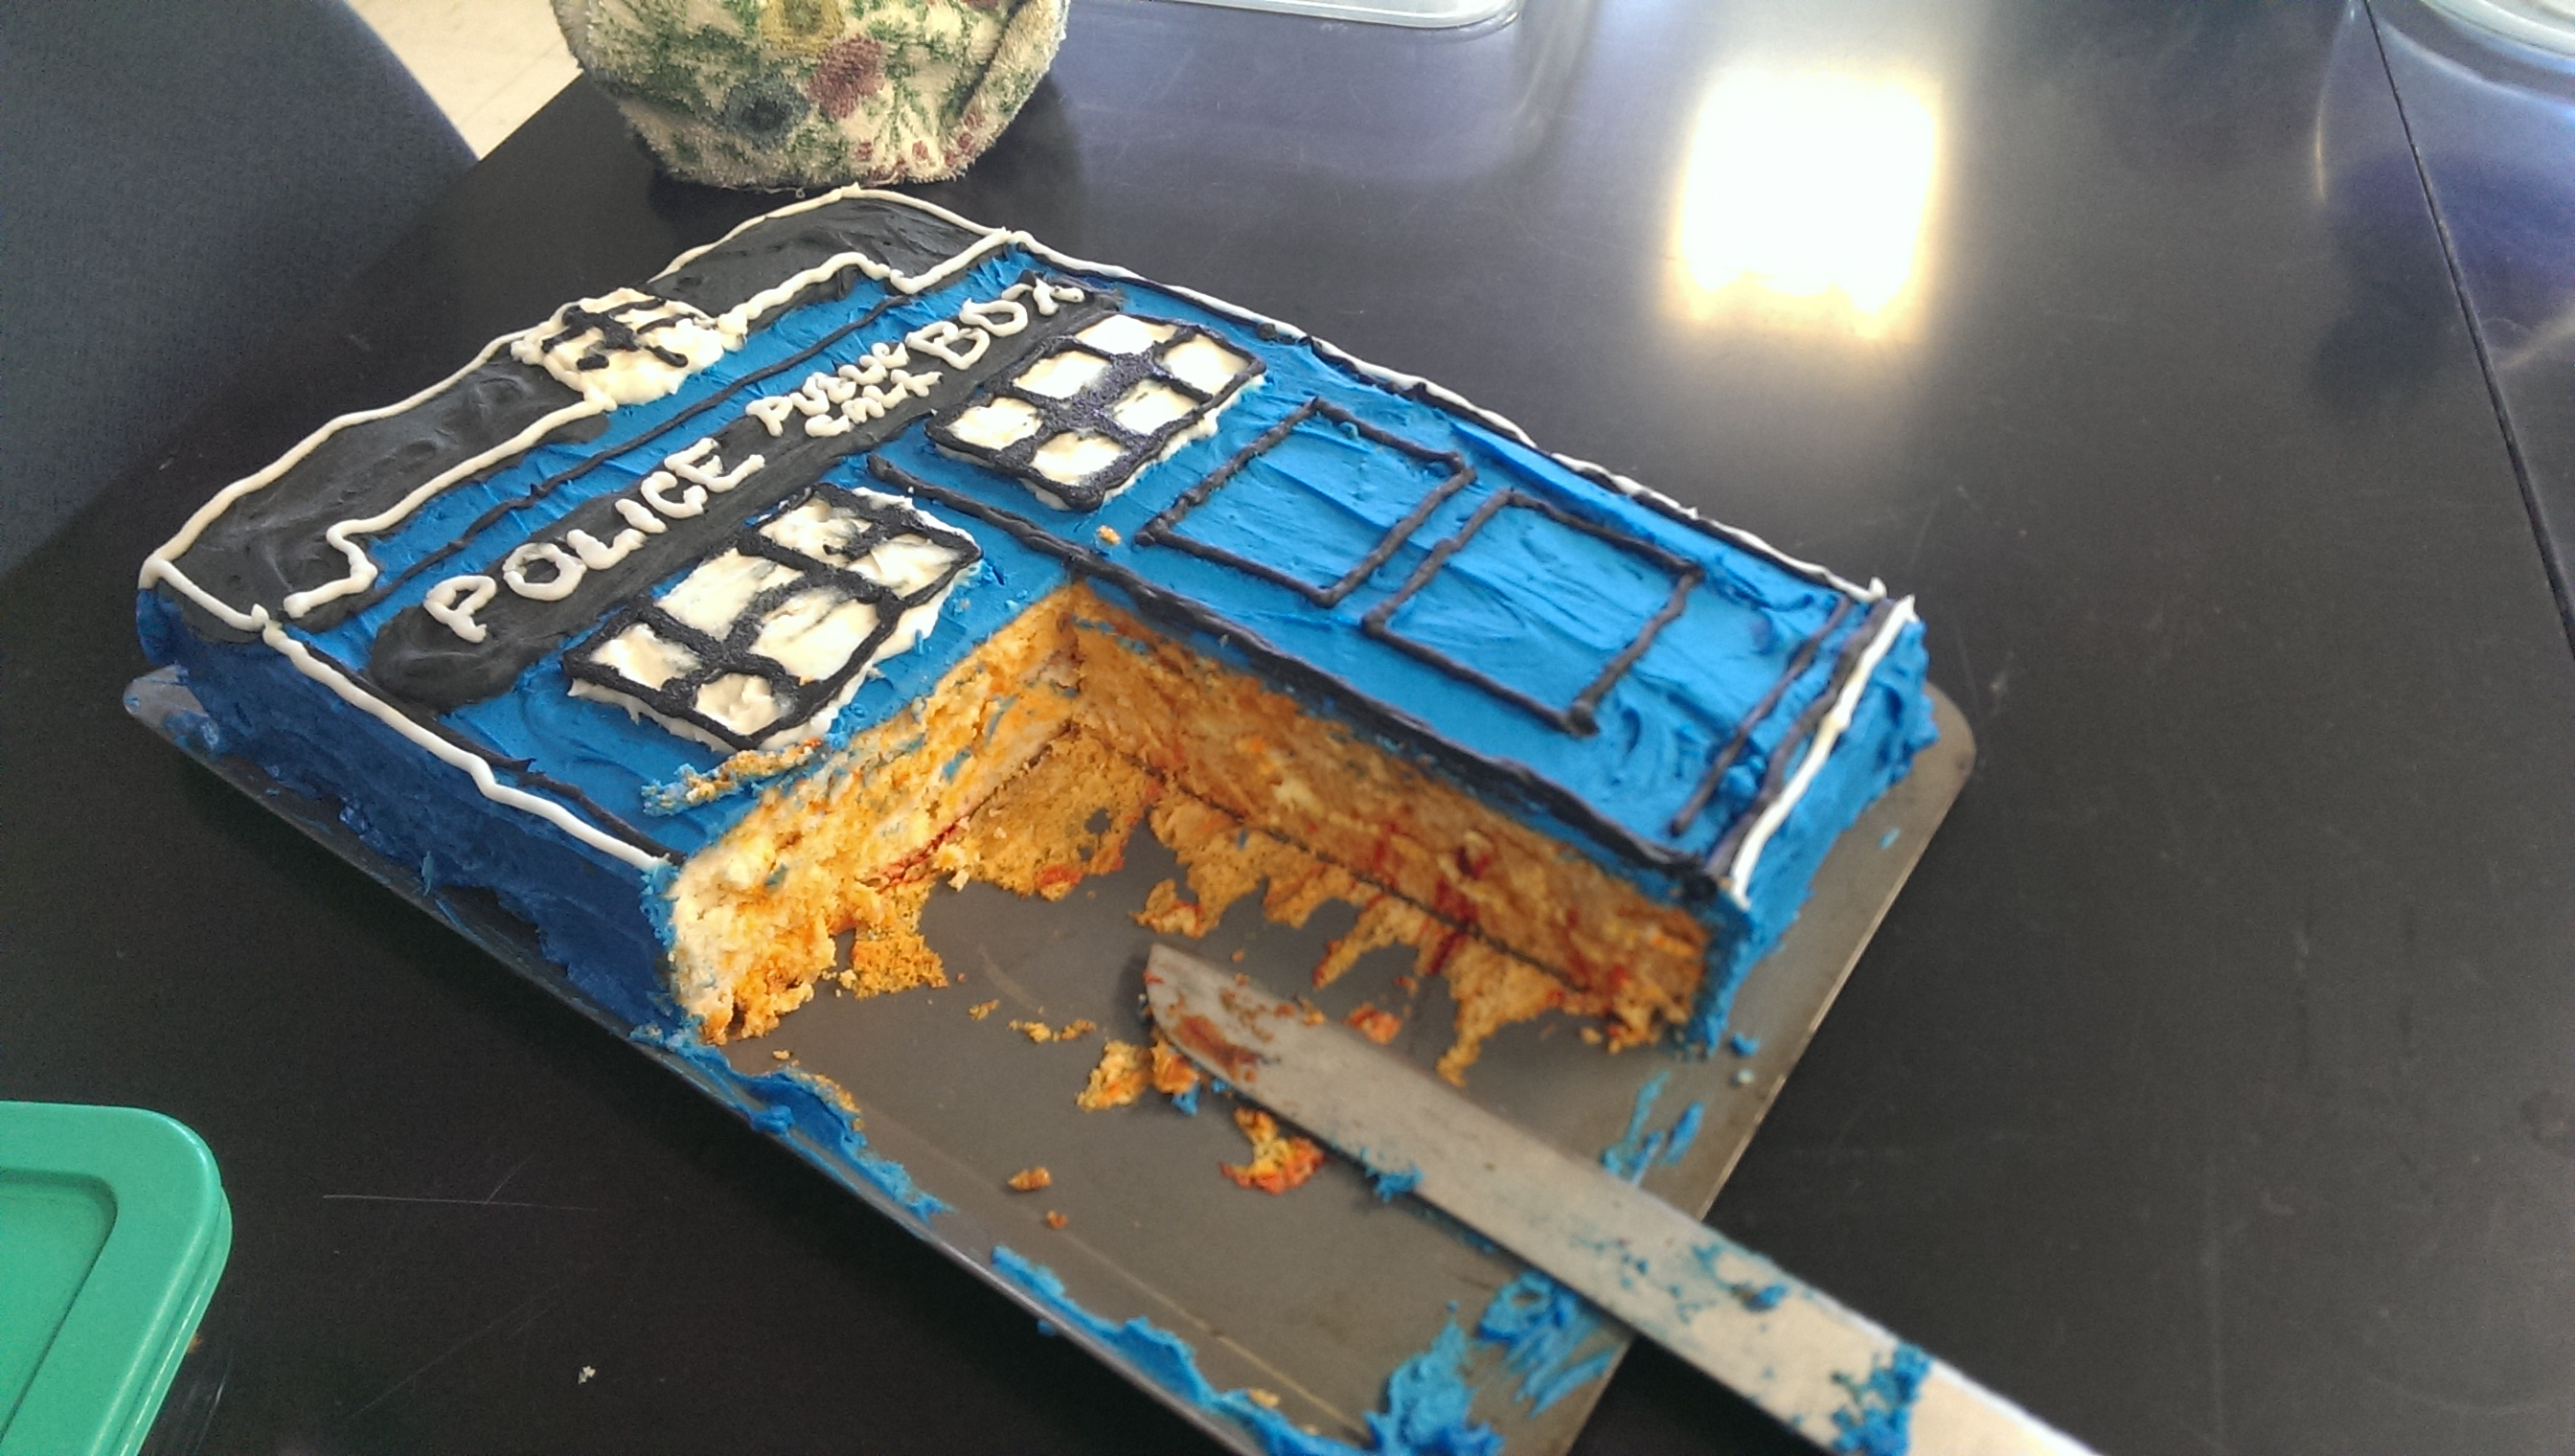 Dr Who Tardis Cake standingoutinmyfield